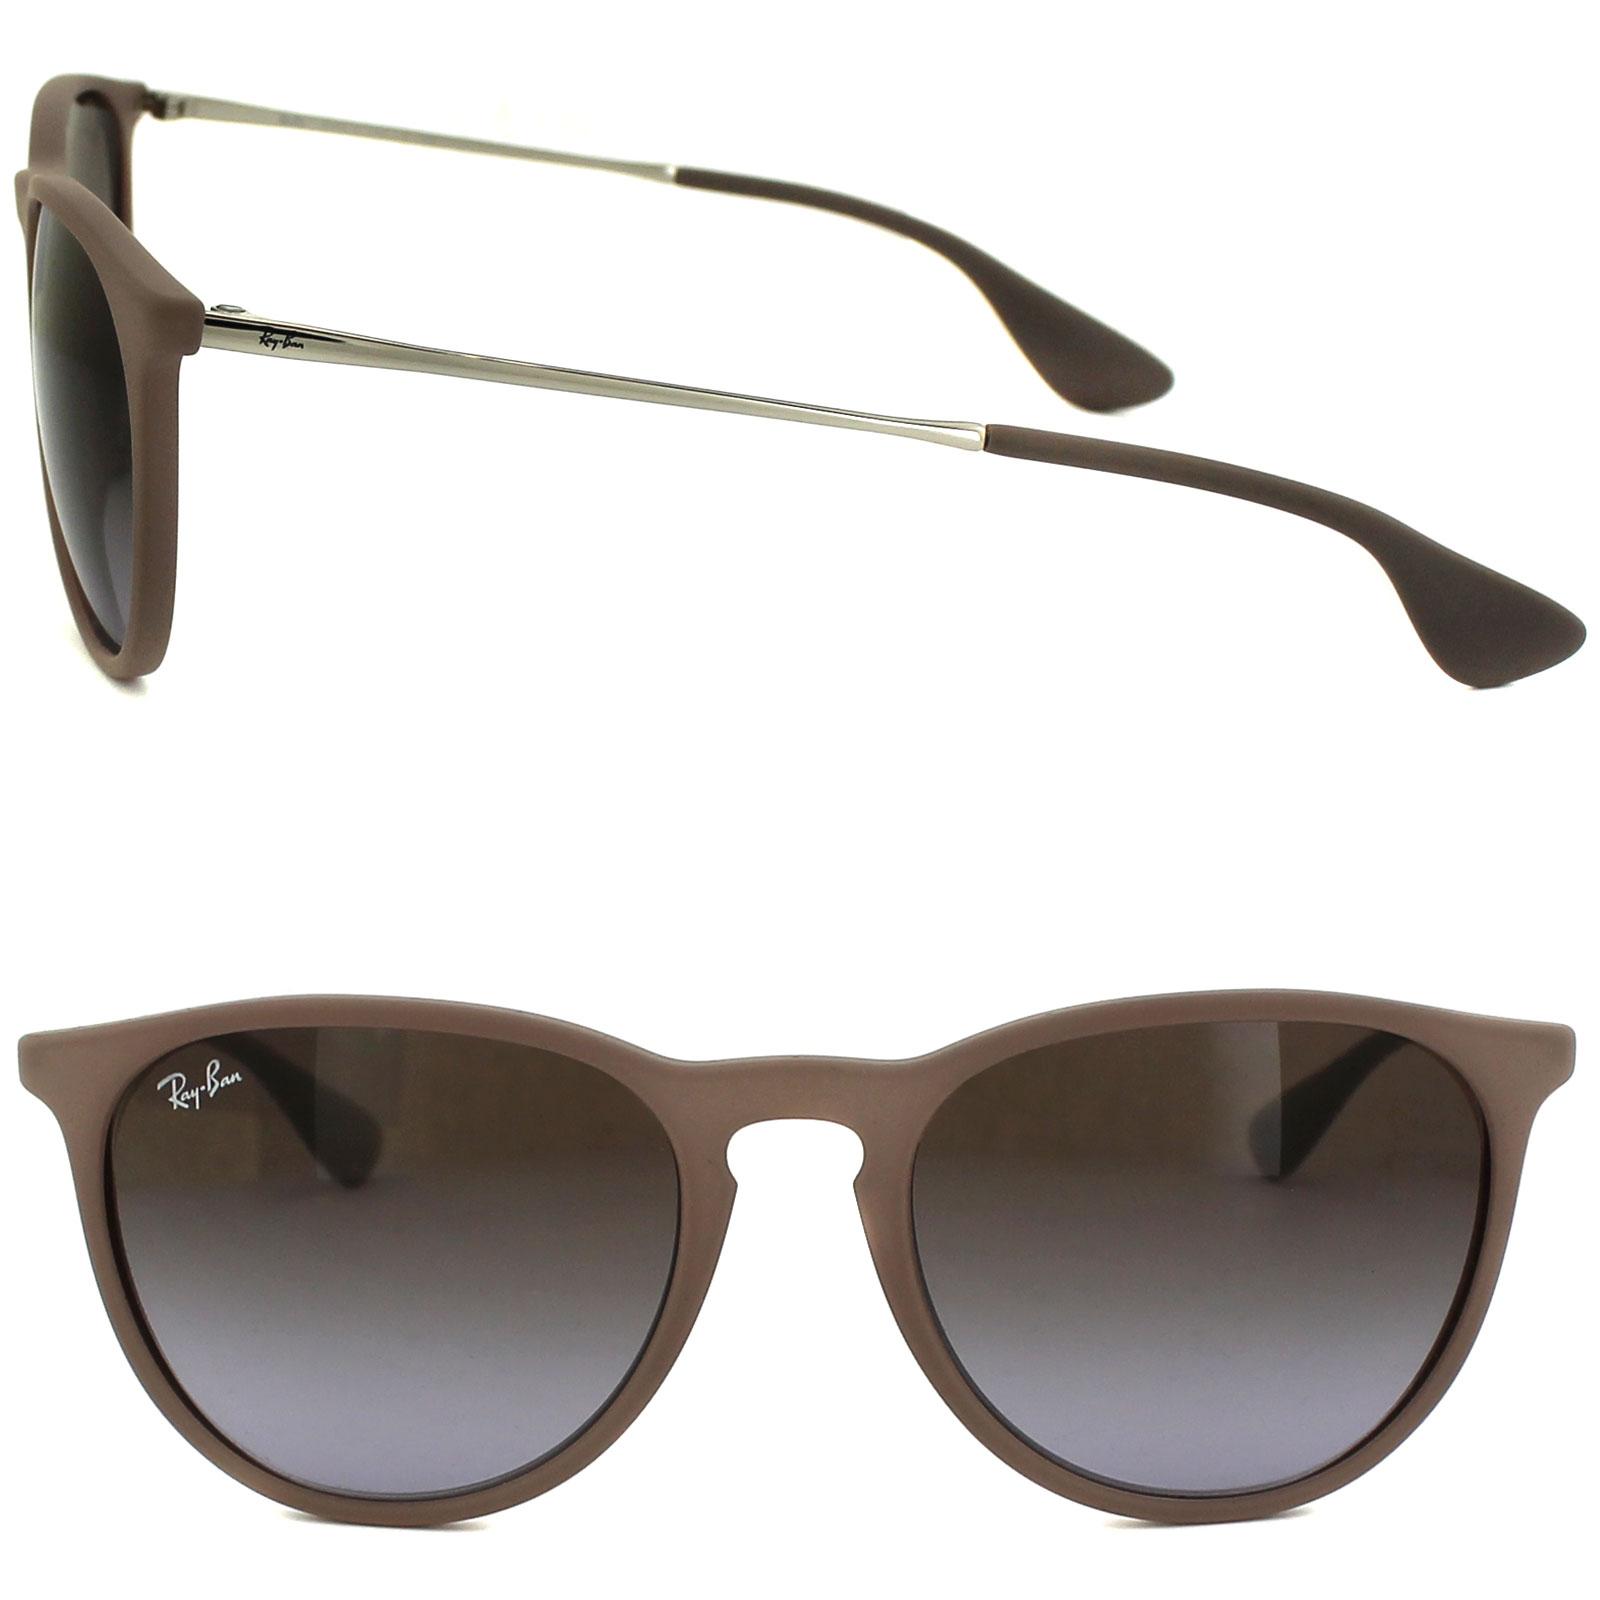 4f0a02f3ee Sentinel Ray-Ban Sunglasses 4171 600068 Dark Rubber Sand Brown Gradient